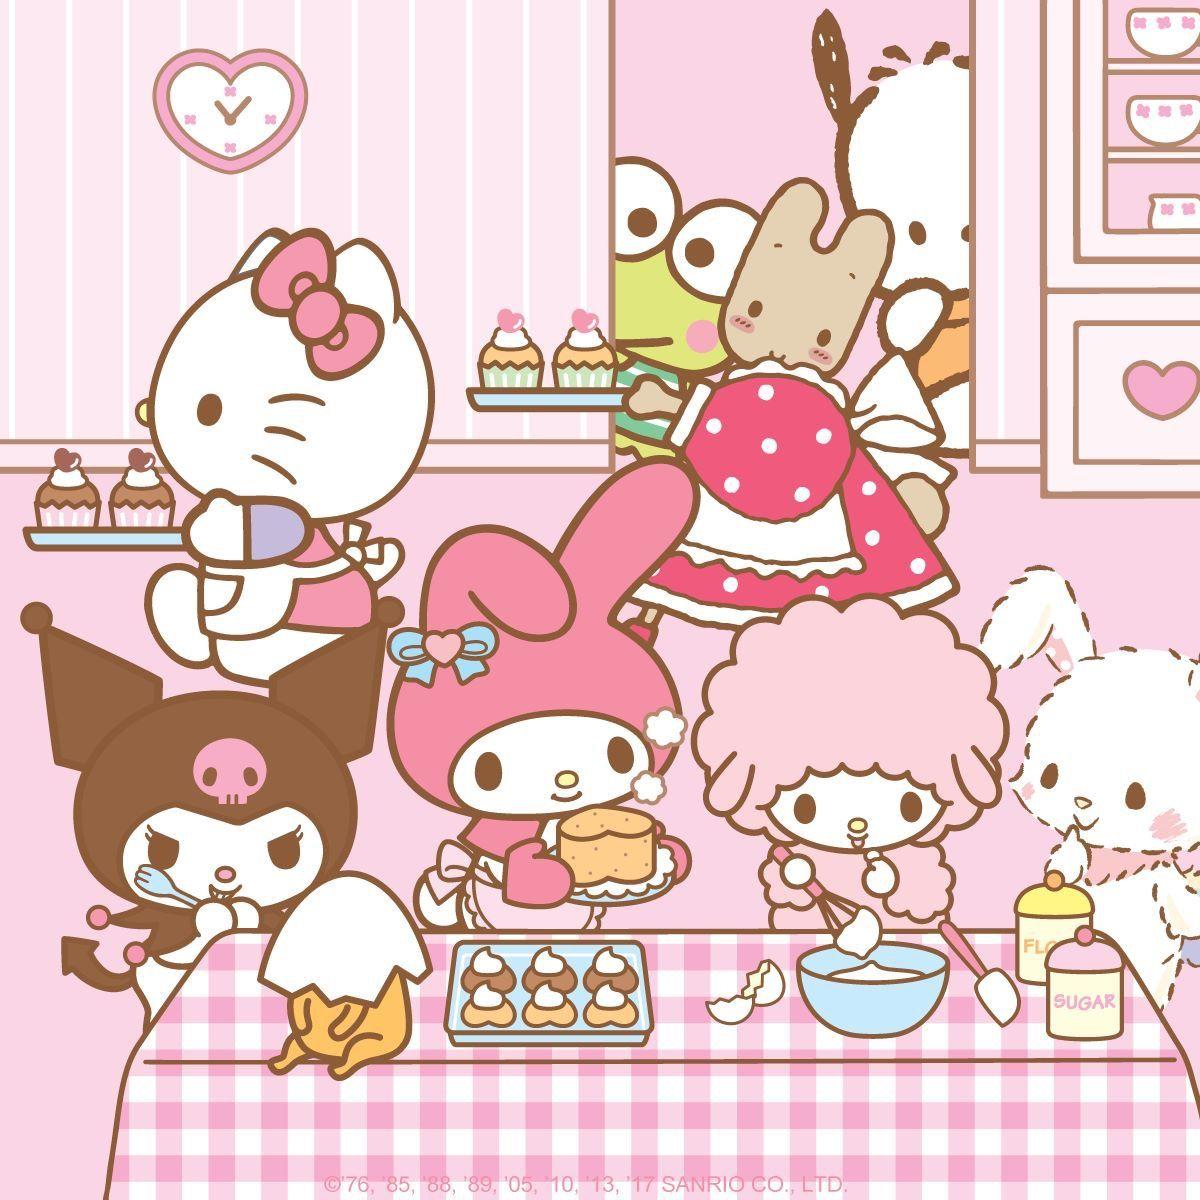 Sanrio Wallpaper Hello Kitty Wallpaper Tamagotchi Sanrio